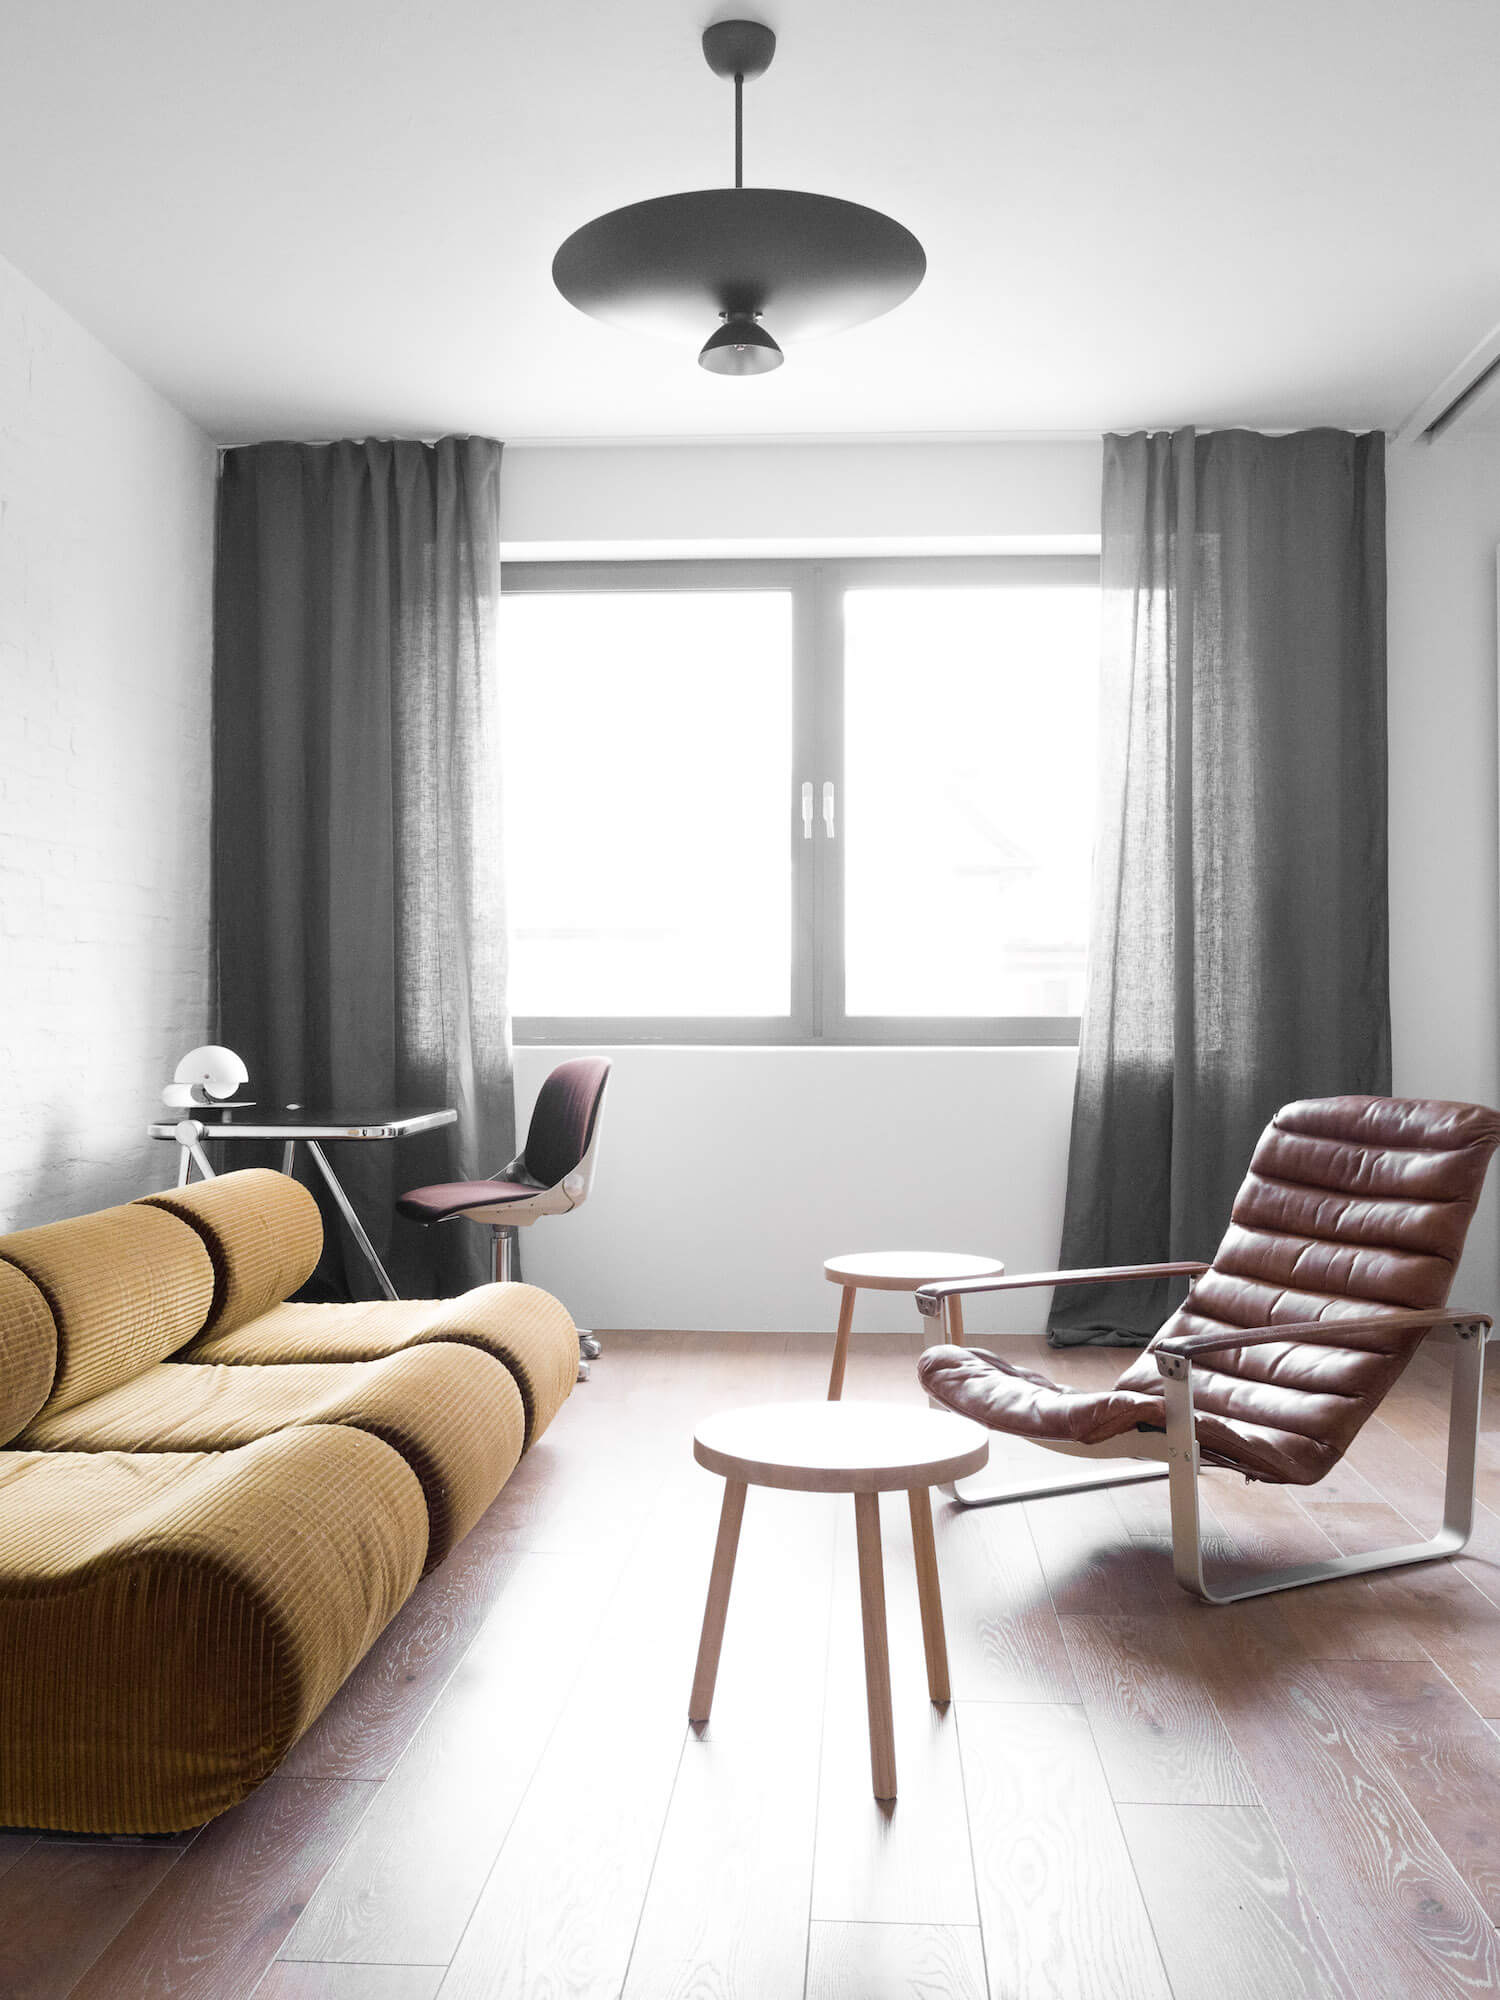 est living house by the park loft kolasinski 9